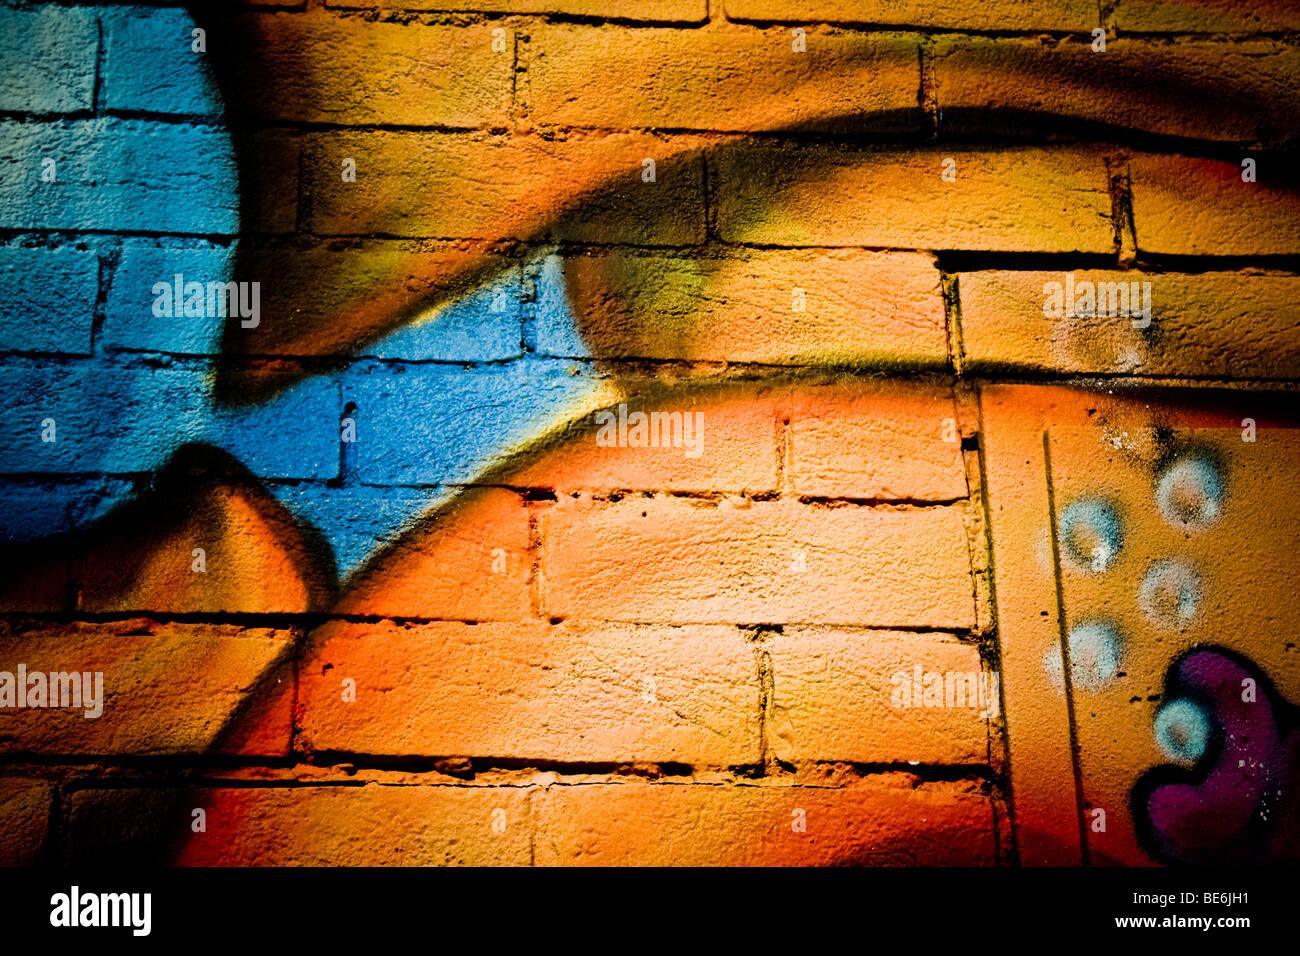 Graffiti of the Cowley Road,Oxford - Stock Image